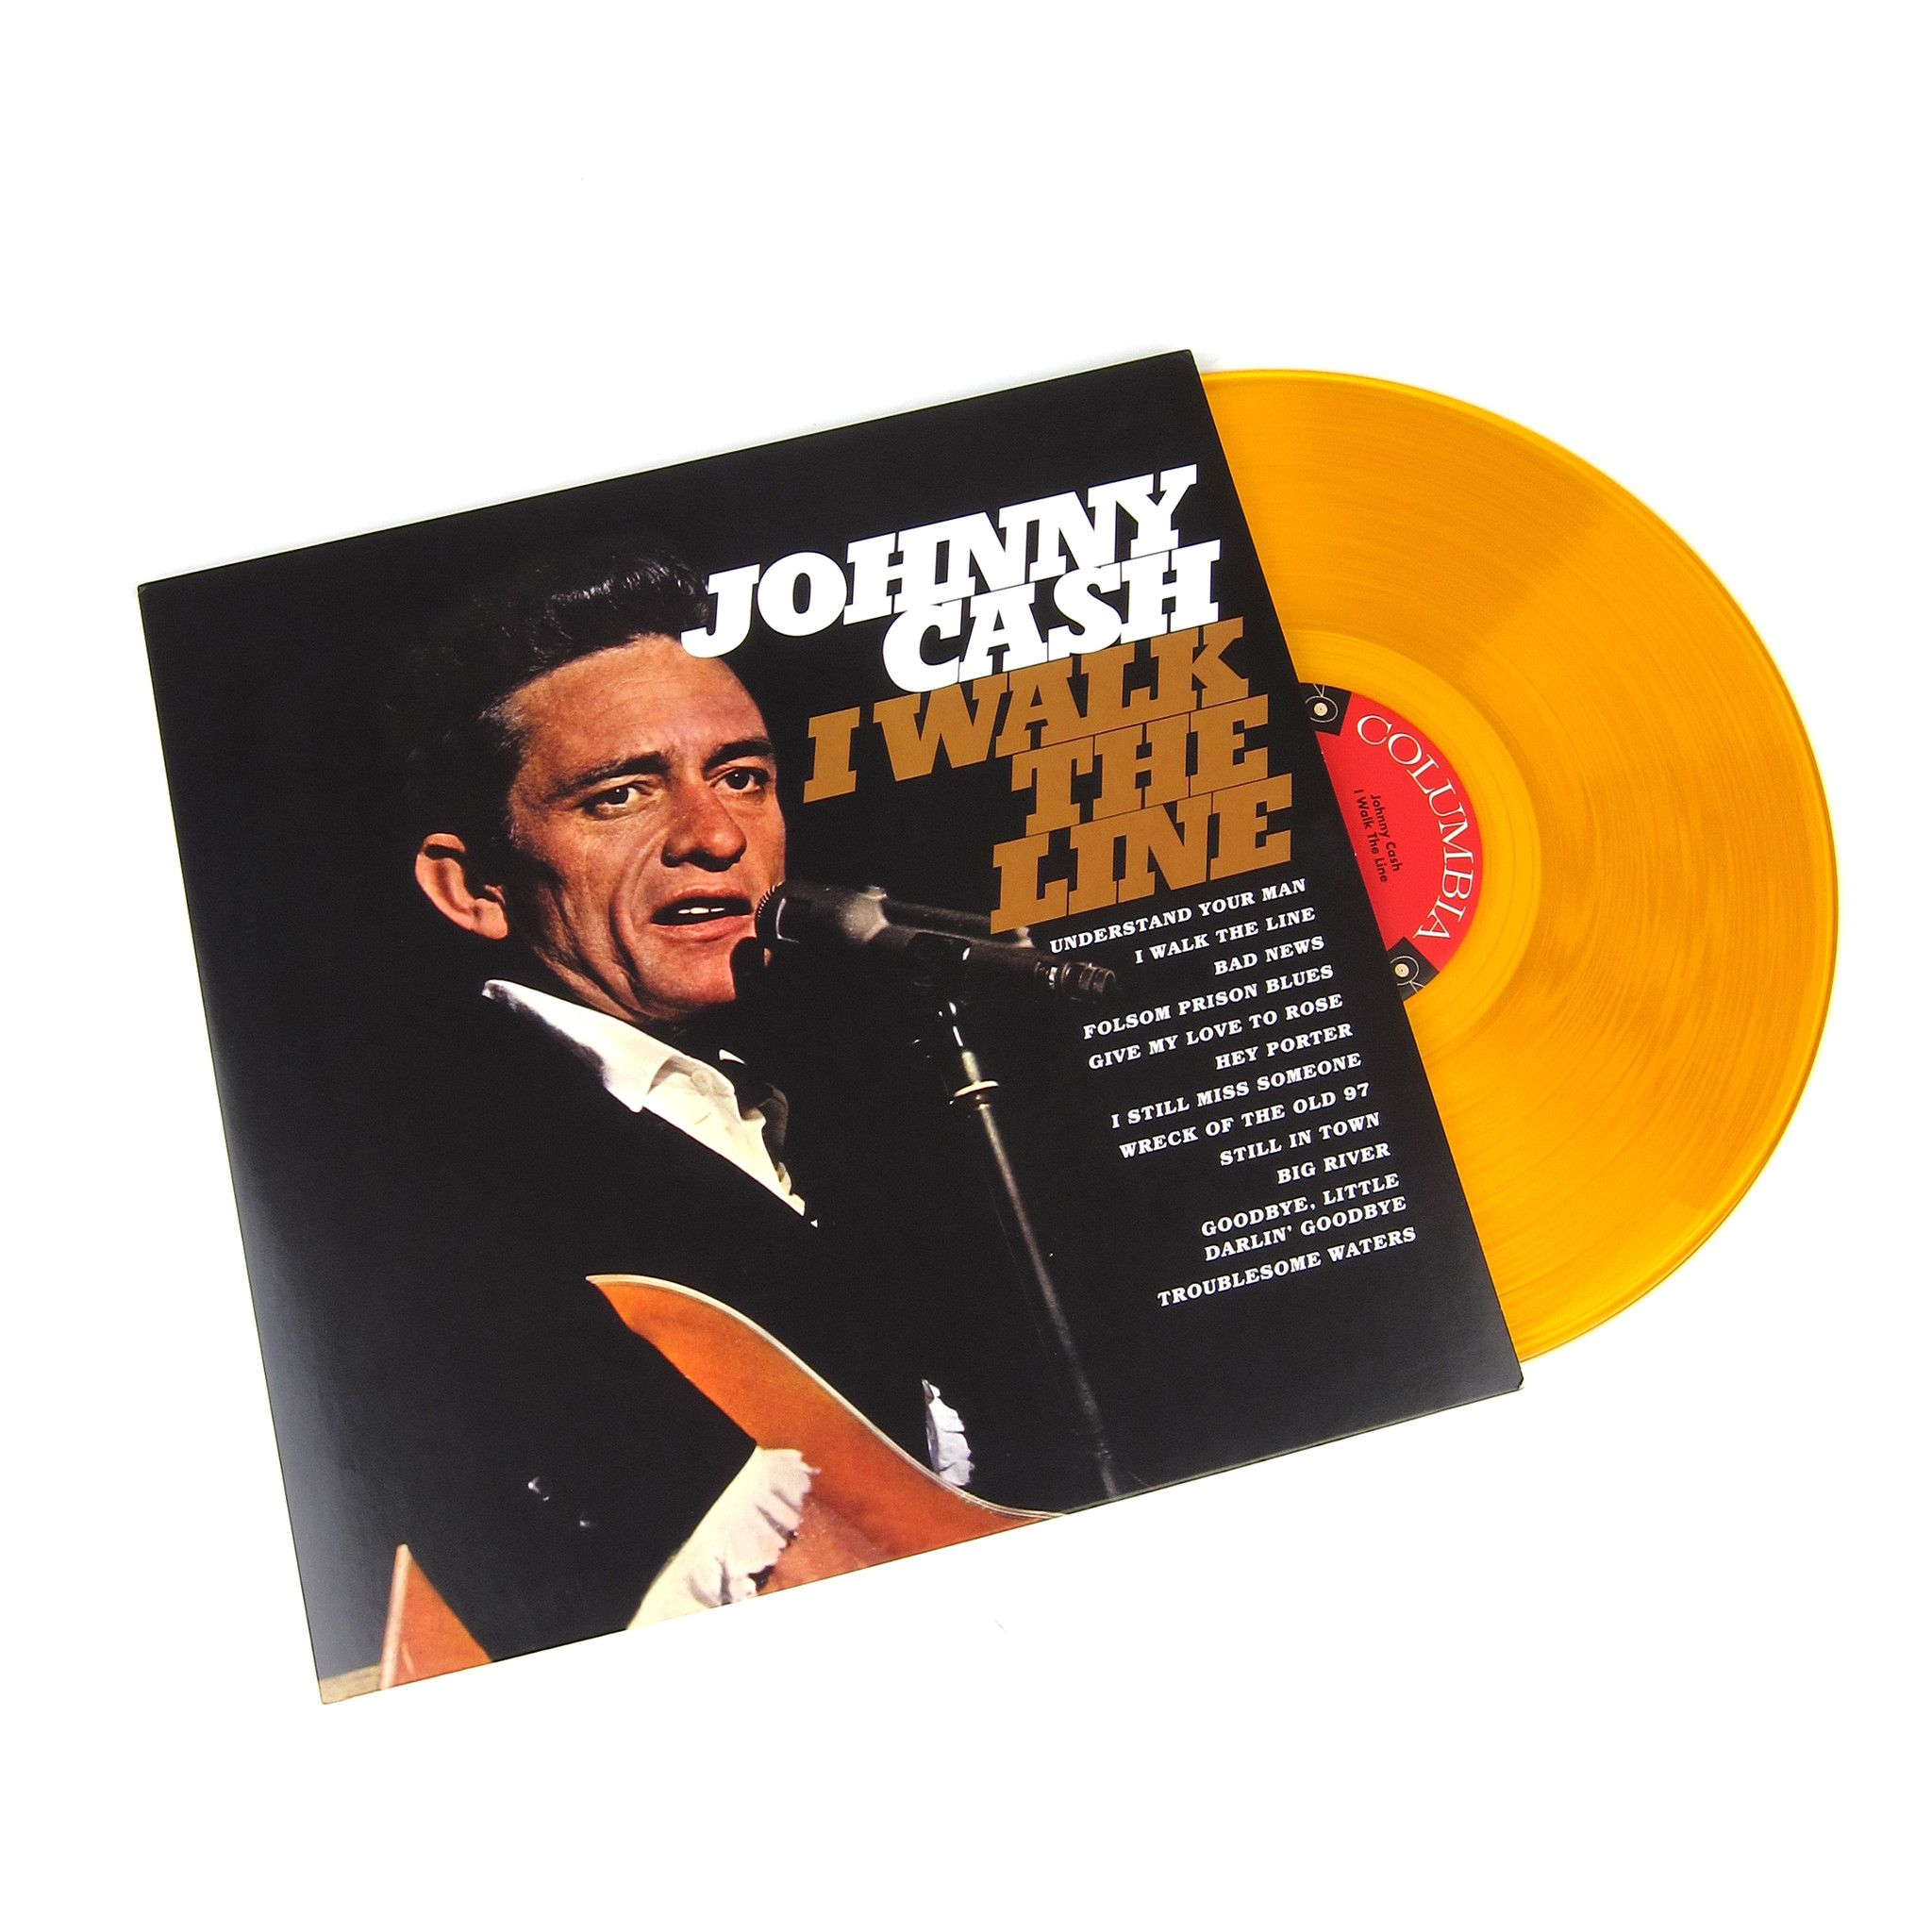 Johnny Cash I Walk The Line 180g Colored Vinyl Vinyl Lp Johnny Cash Vinyl Johnny Cash Vinyl